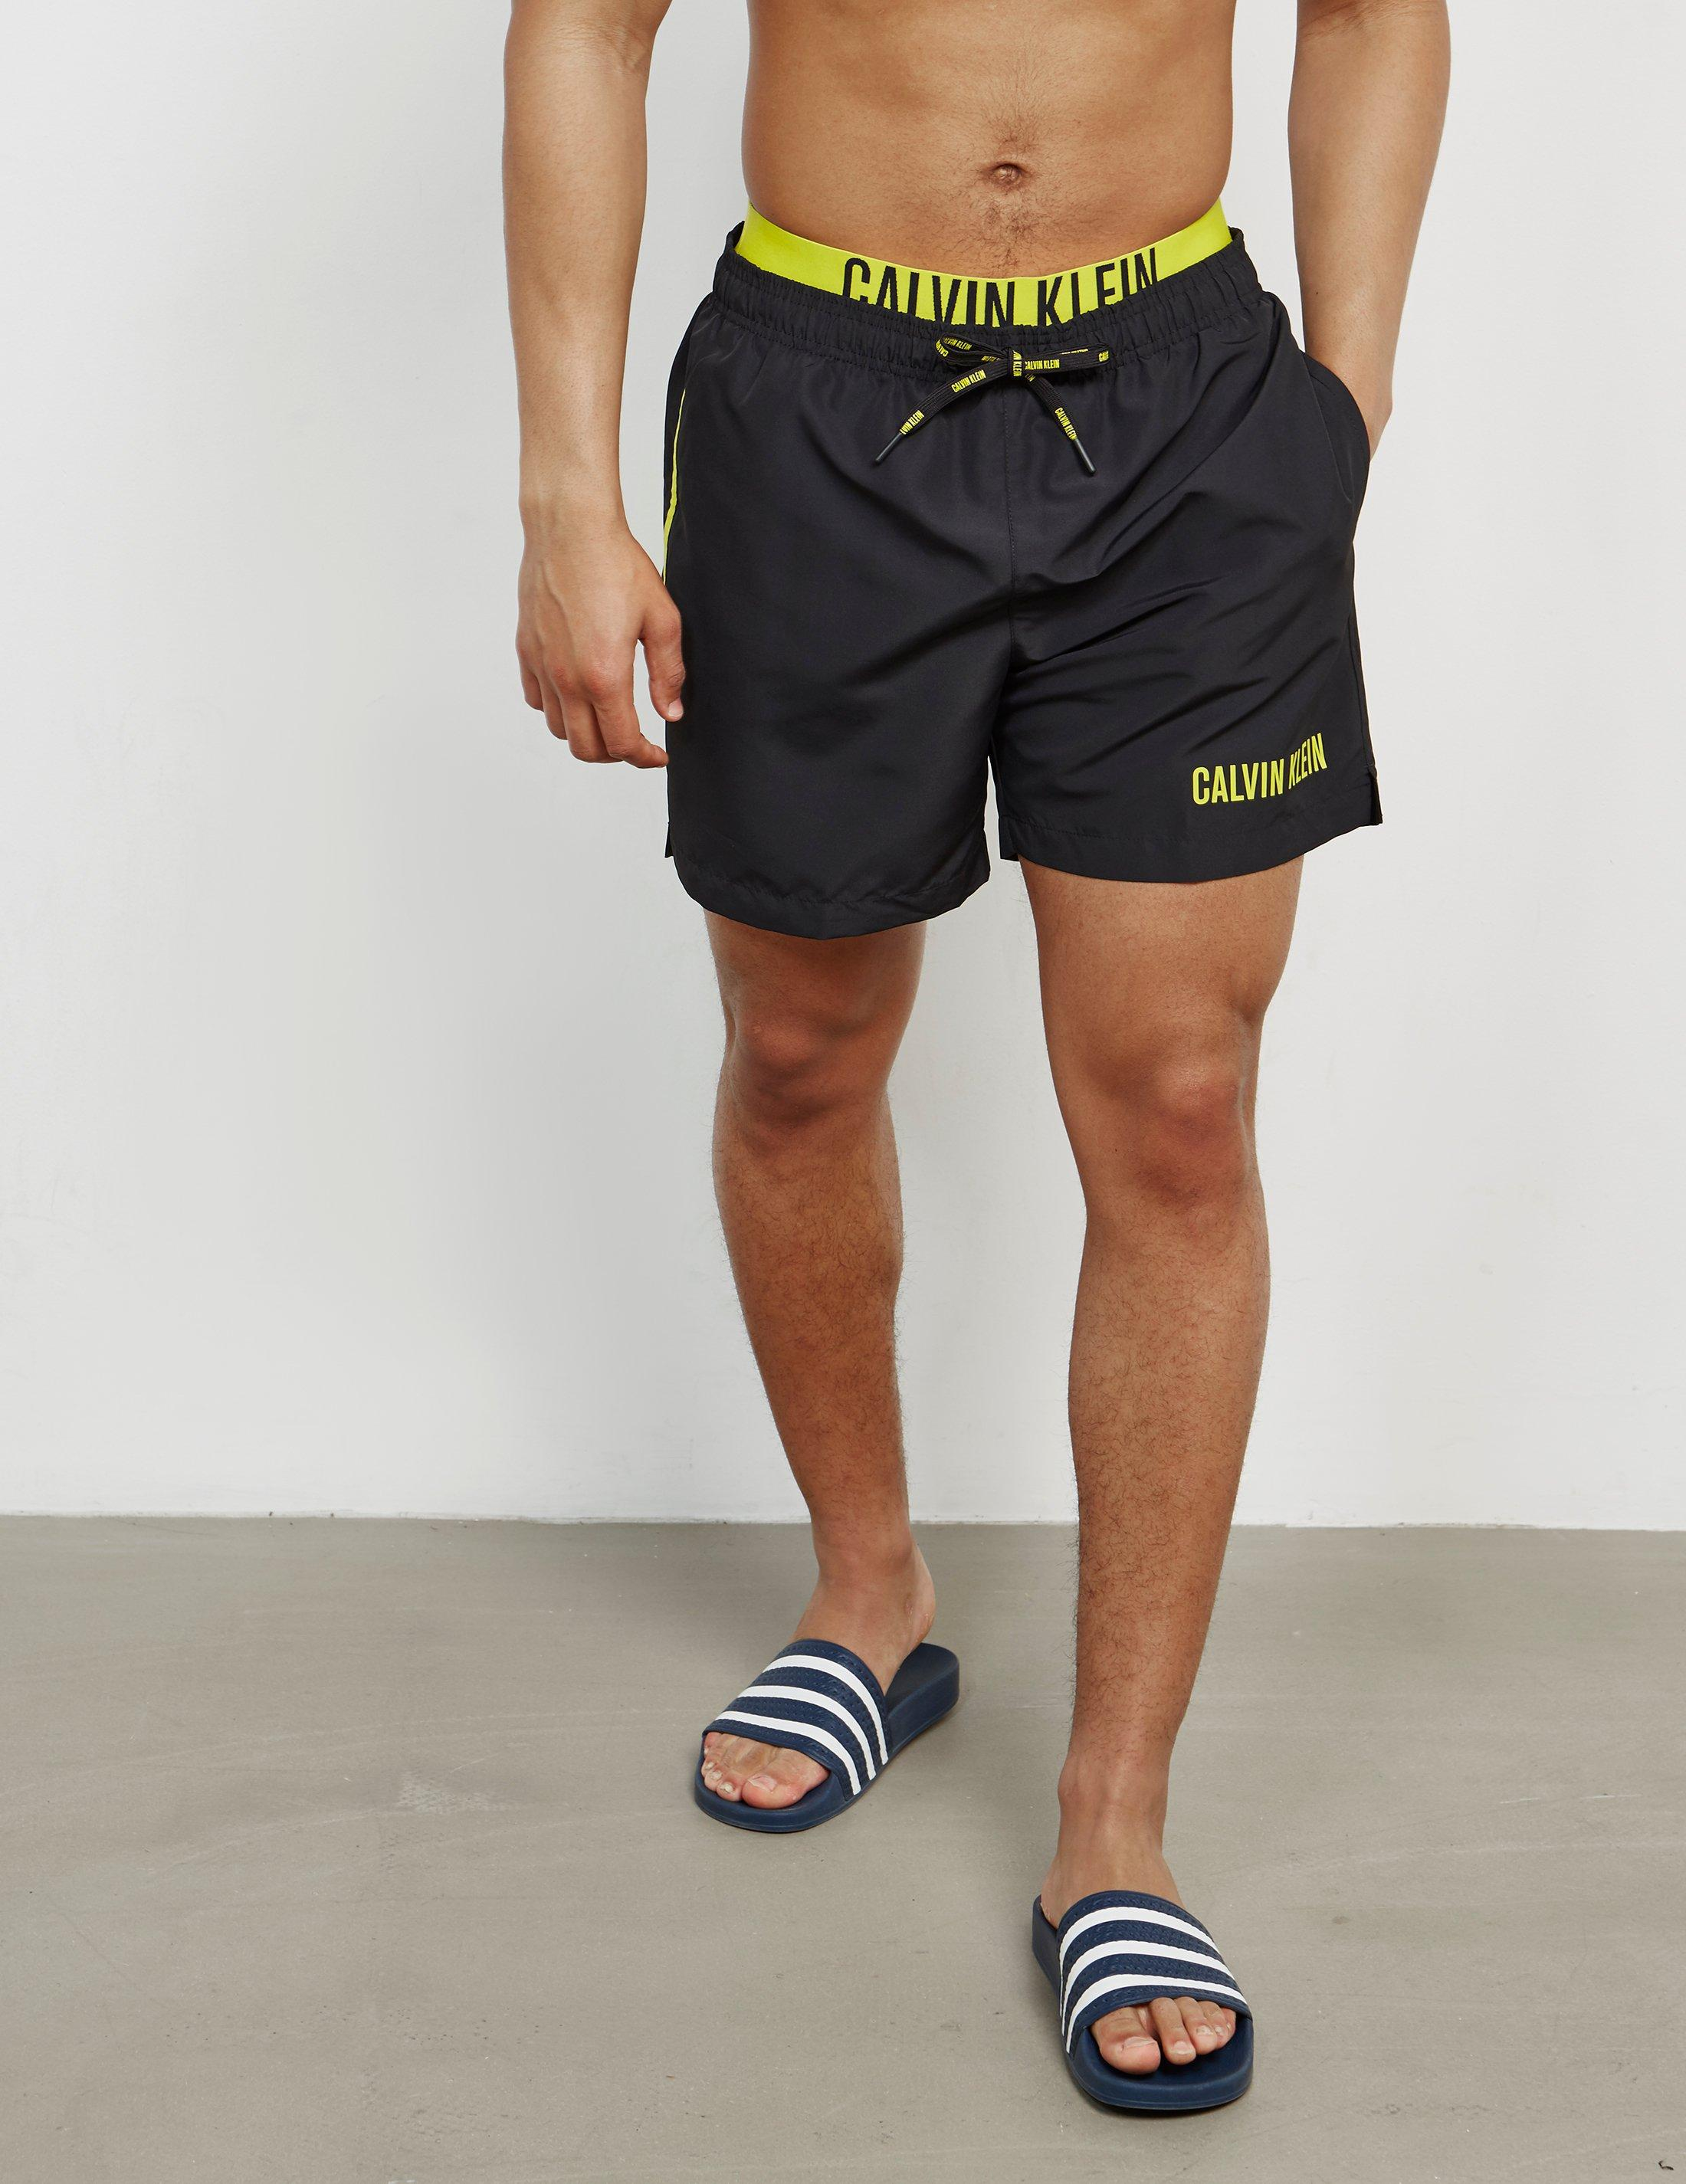 719e0de5db Calvin Klein Mens Double Waistband Swim Shorts Black in Black for ...